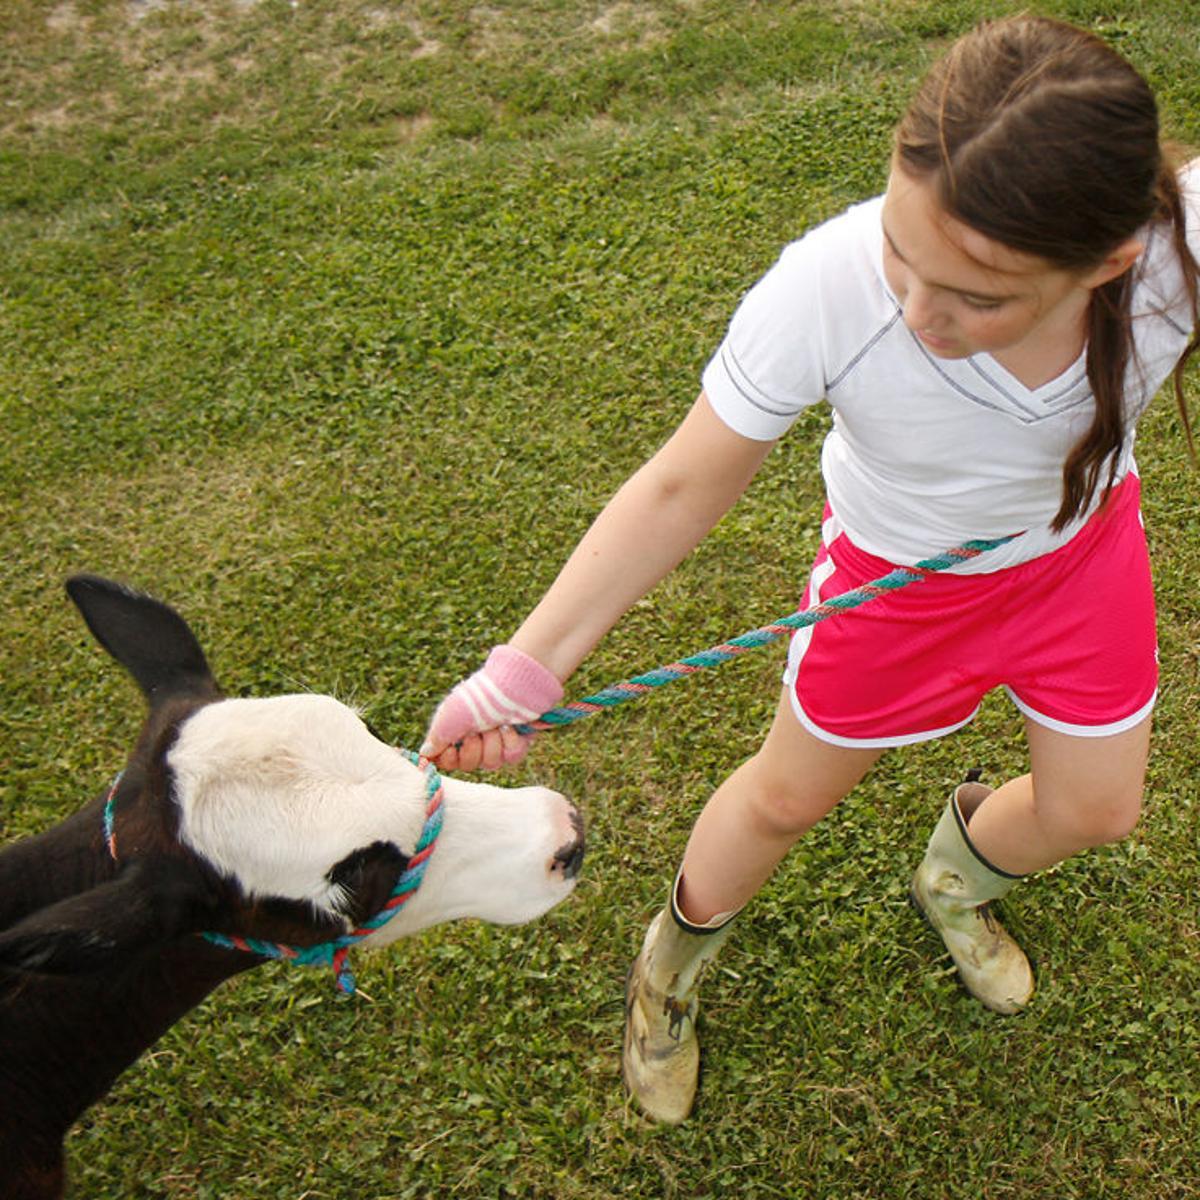 4-H Bucket Calf Project combats family farm decline   News